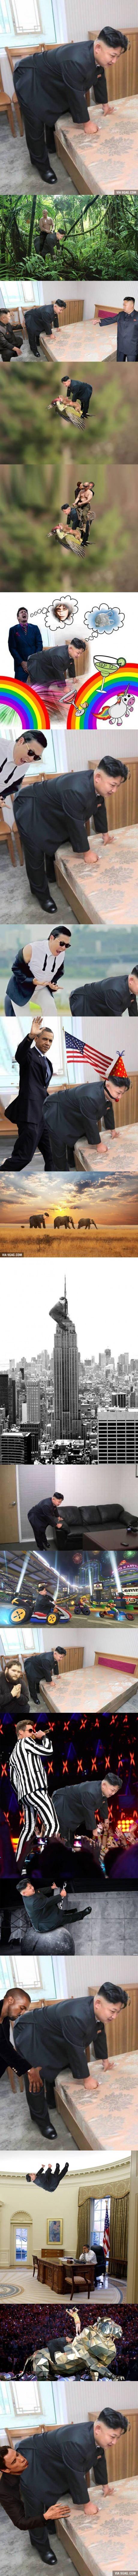 Hilarious Memes 20+ Pics